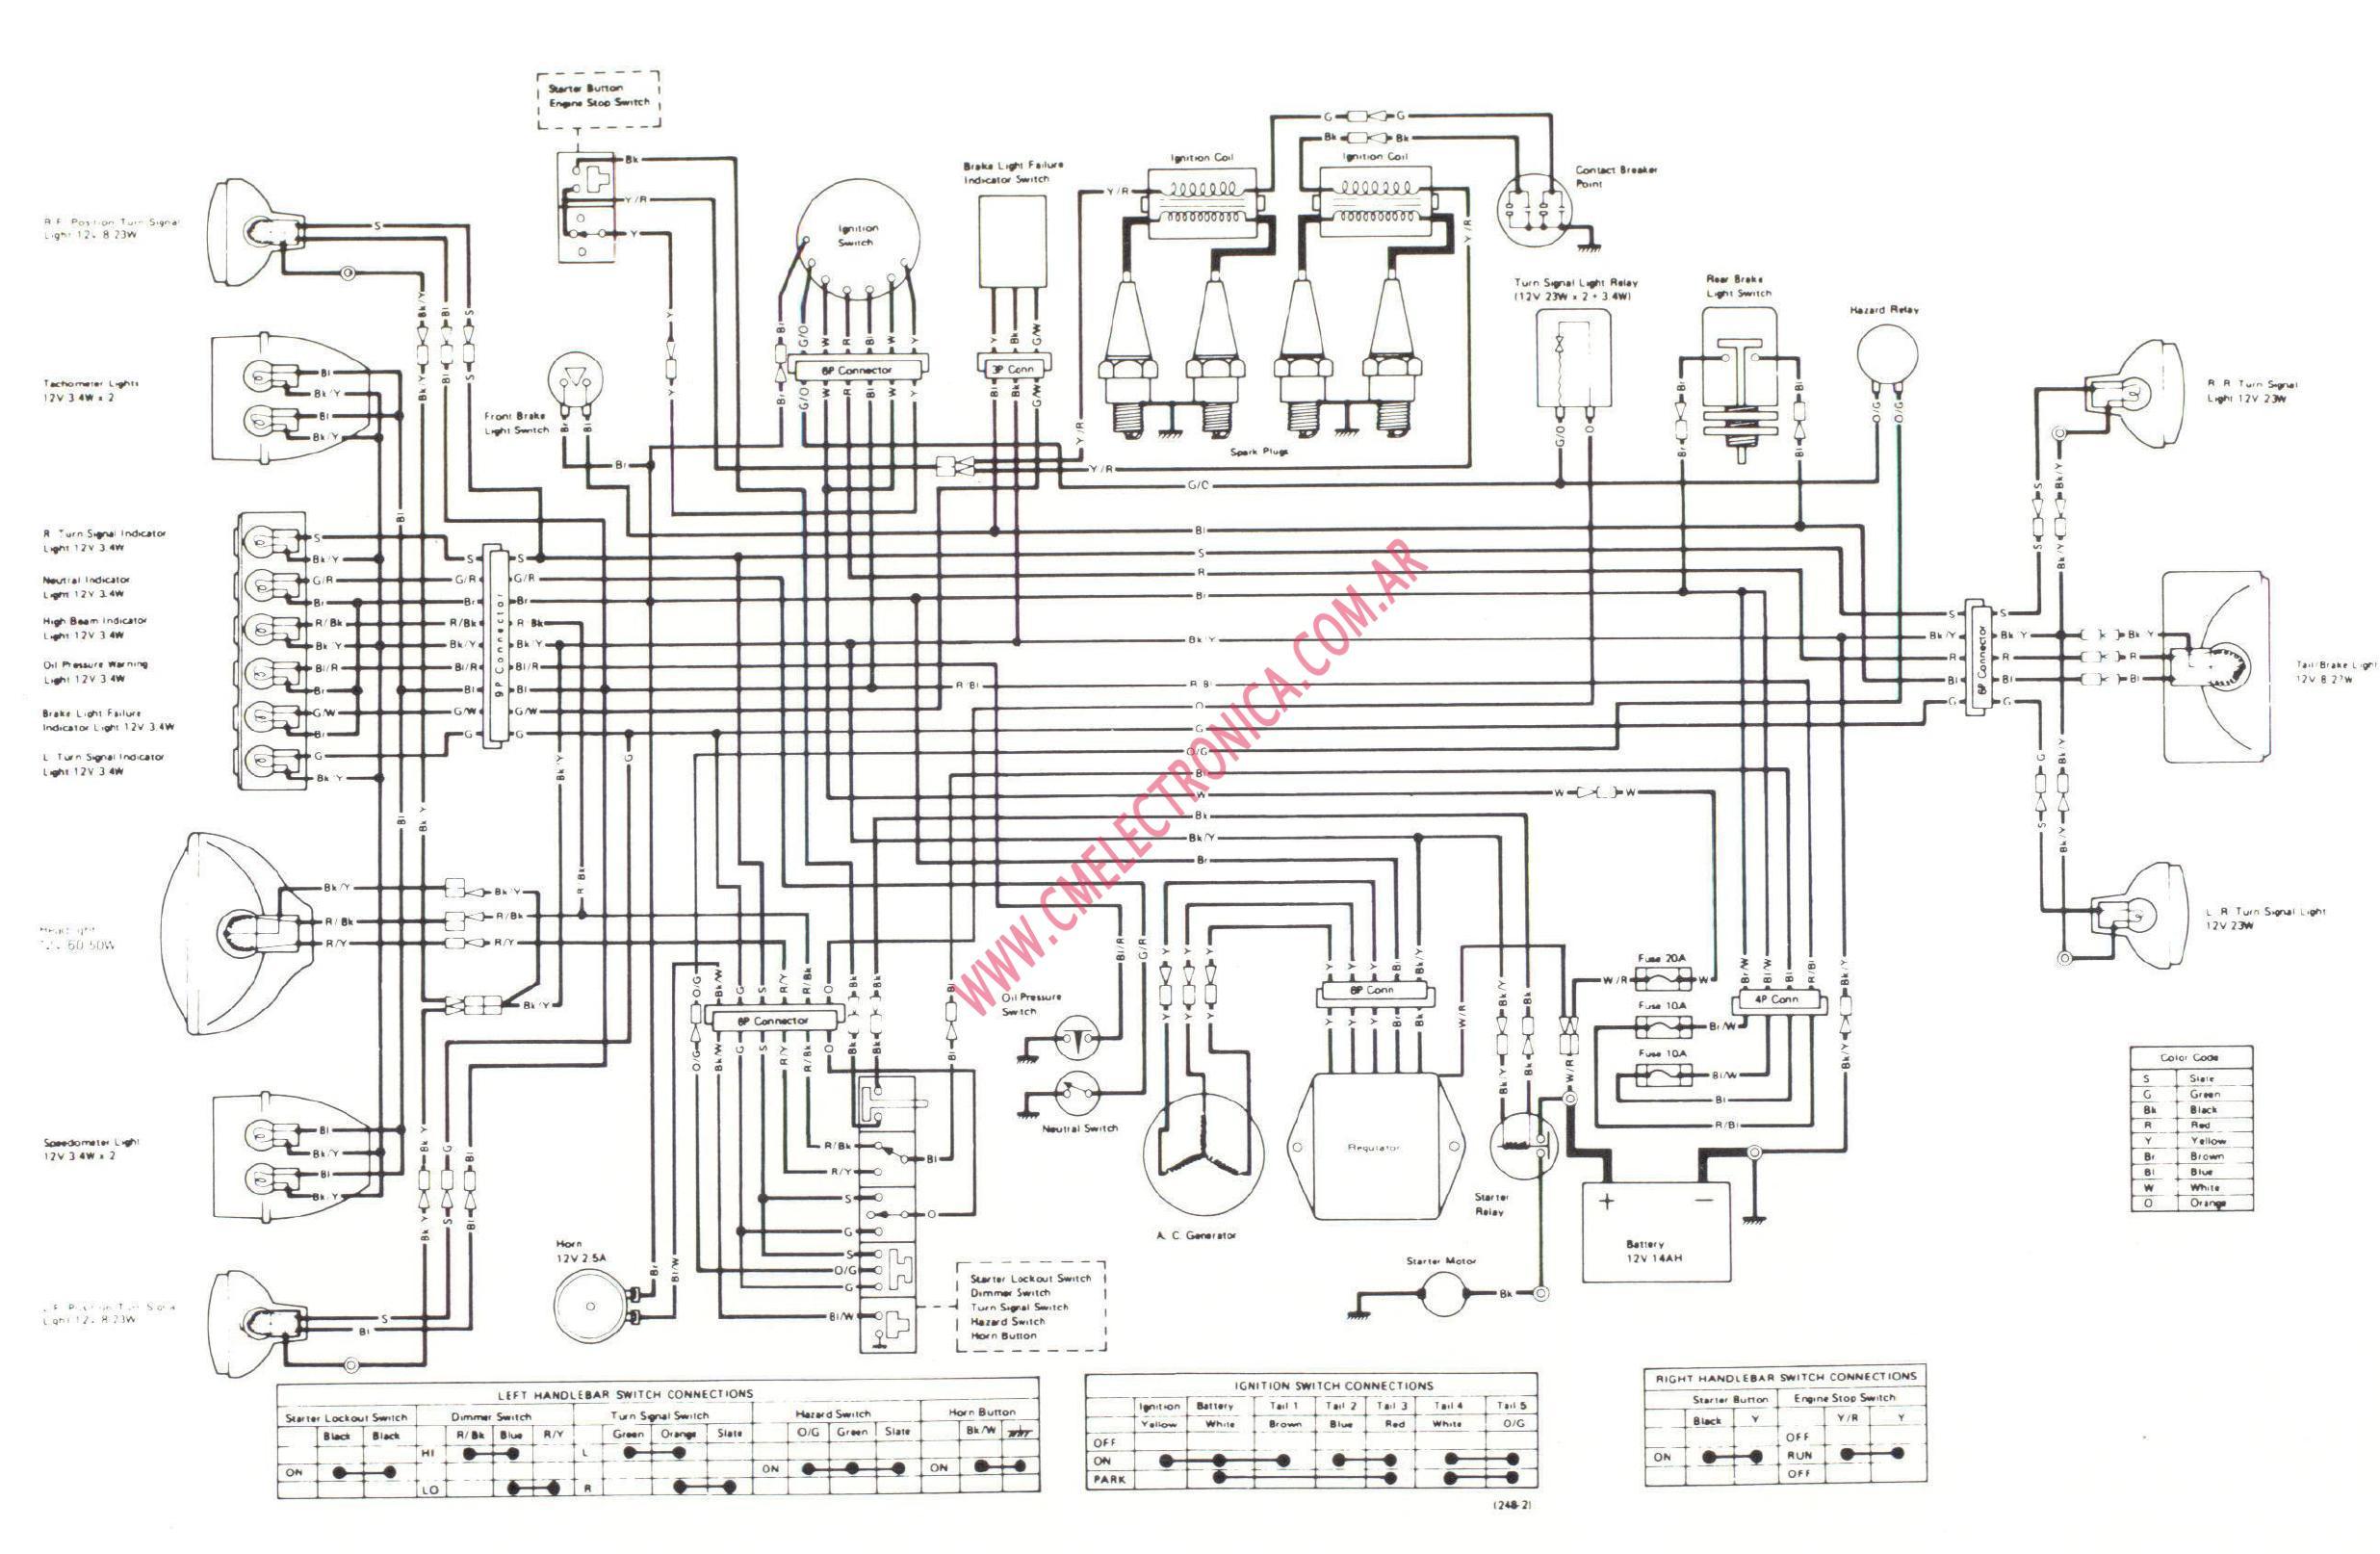 1978 kz1000 wiring diagram different ear piercings kawasaki motorcycle diagrams 83 get free